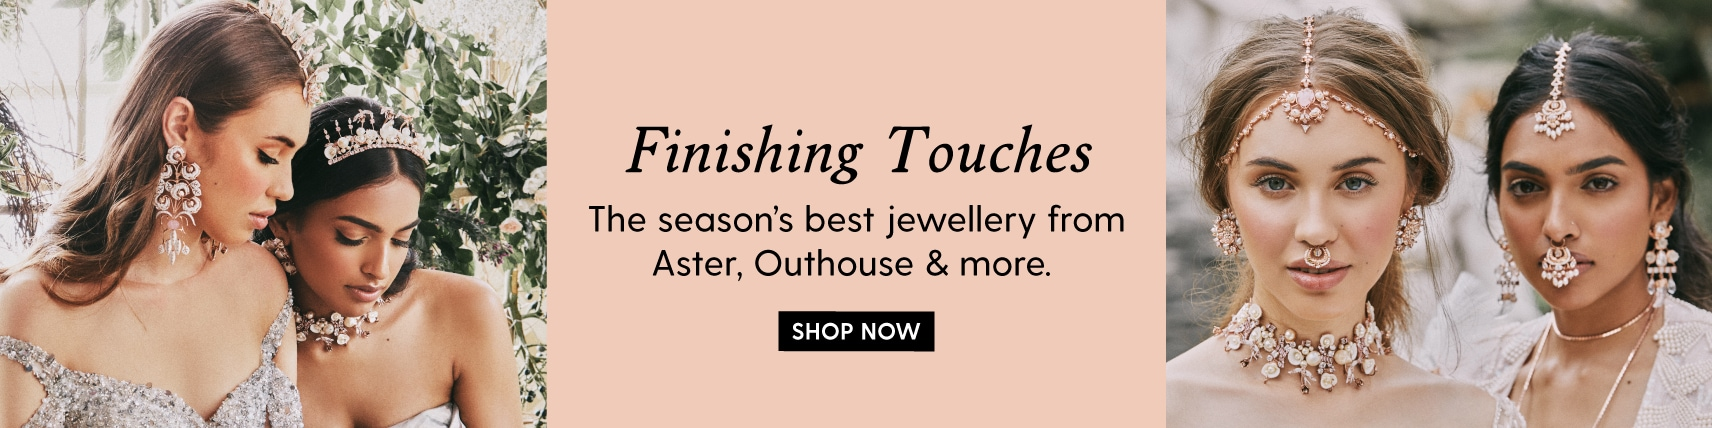 jewellery/?designers=outhouse130-aster130-fusio130-rohirajaipur-printsbyradhikajewellery-ivorine130-aaharya130&=&utm_source=LandingPage&utm_medium=Banner&utm_campaign=Jewellery-FinishingTouches